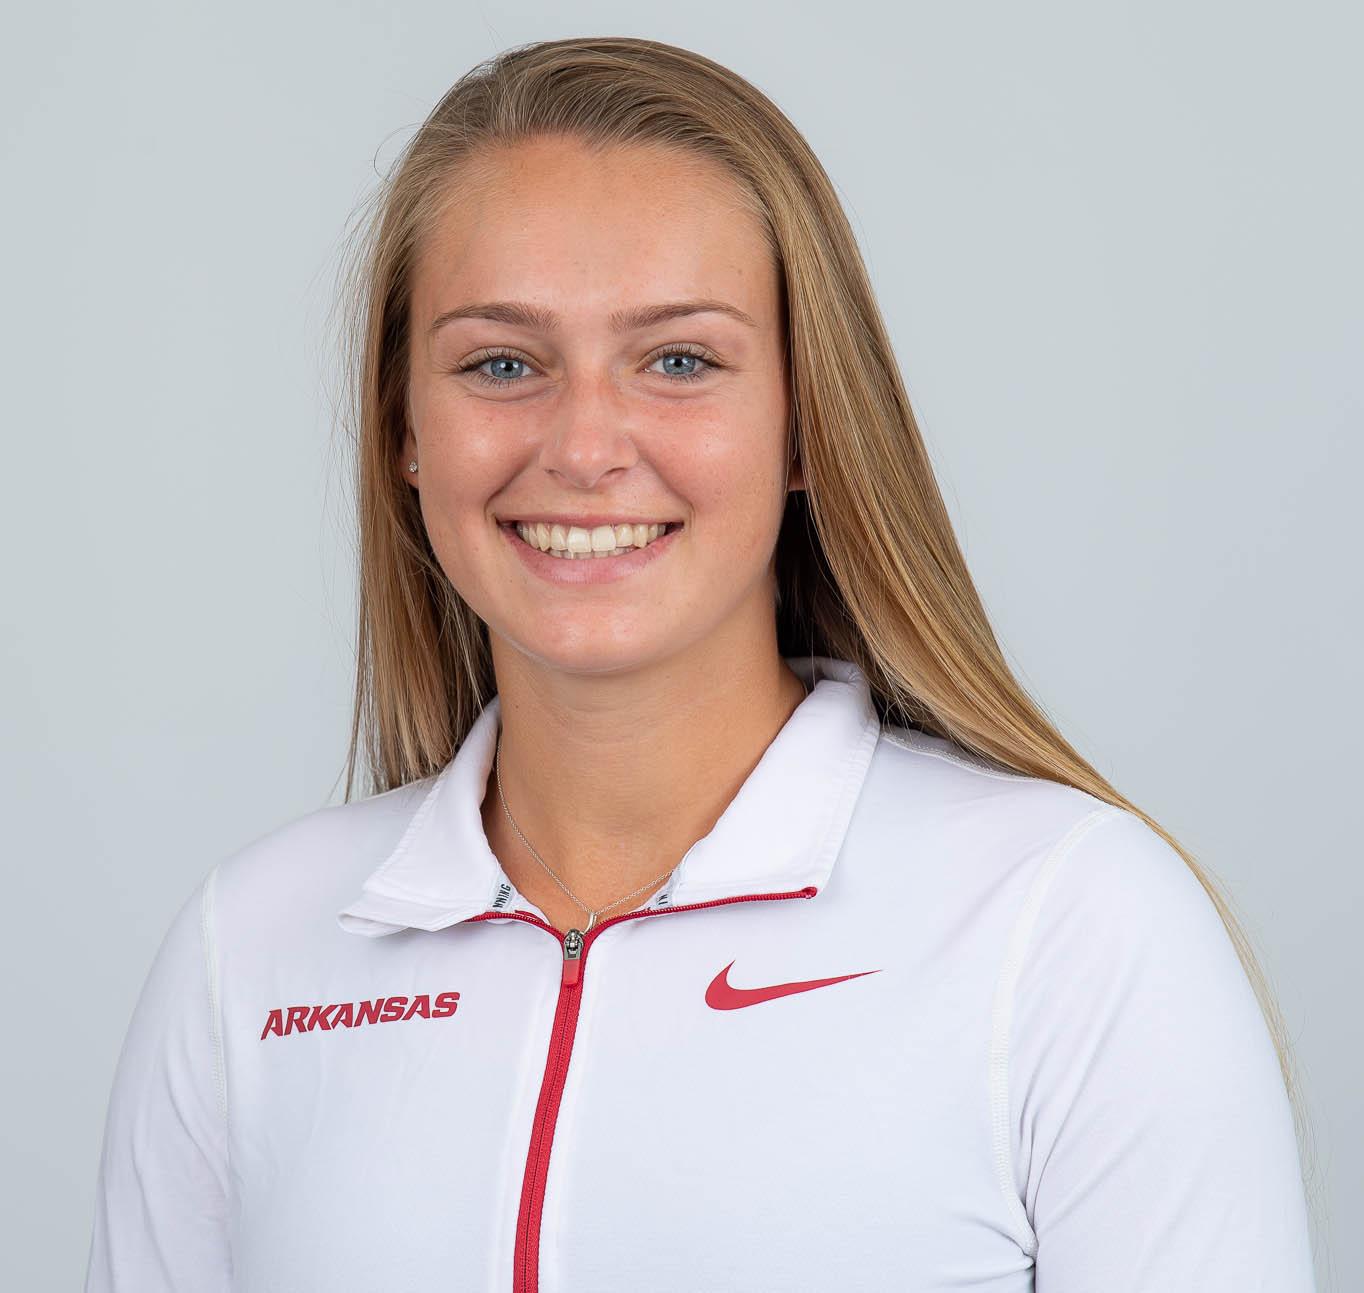 Mackenzie Hayward - Women's Track & Field - Arkansas Razorbacks